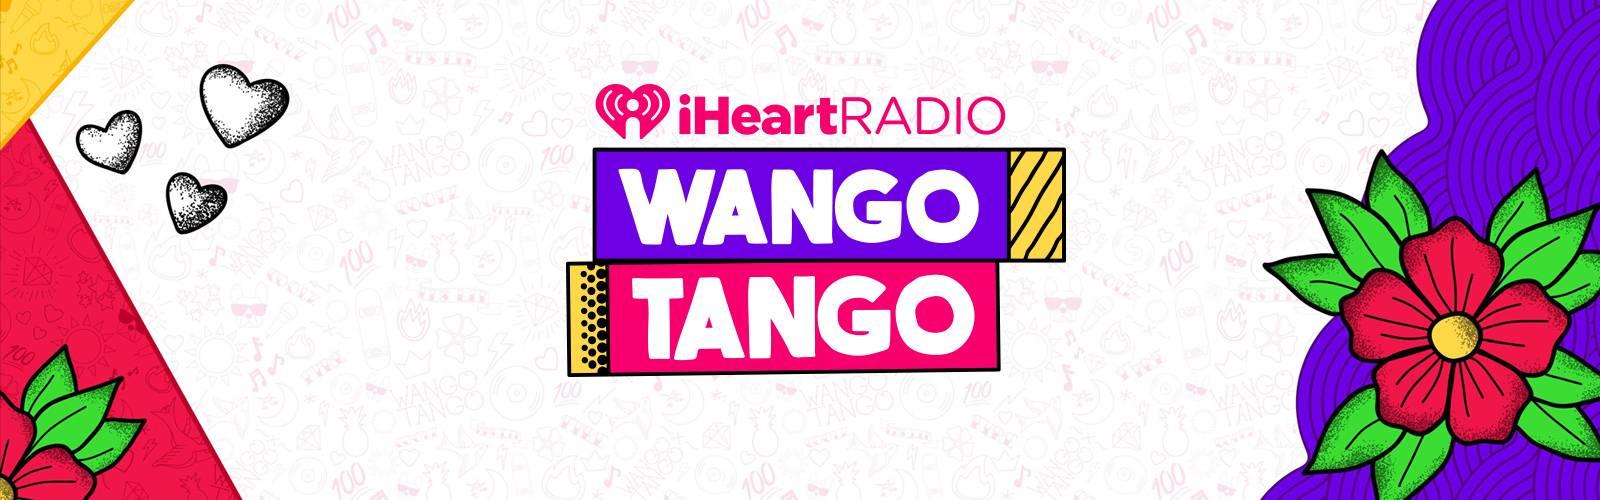 Stream iHeart Wango Tango 2019 LIVE on LiveXLive - Premium Live Music